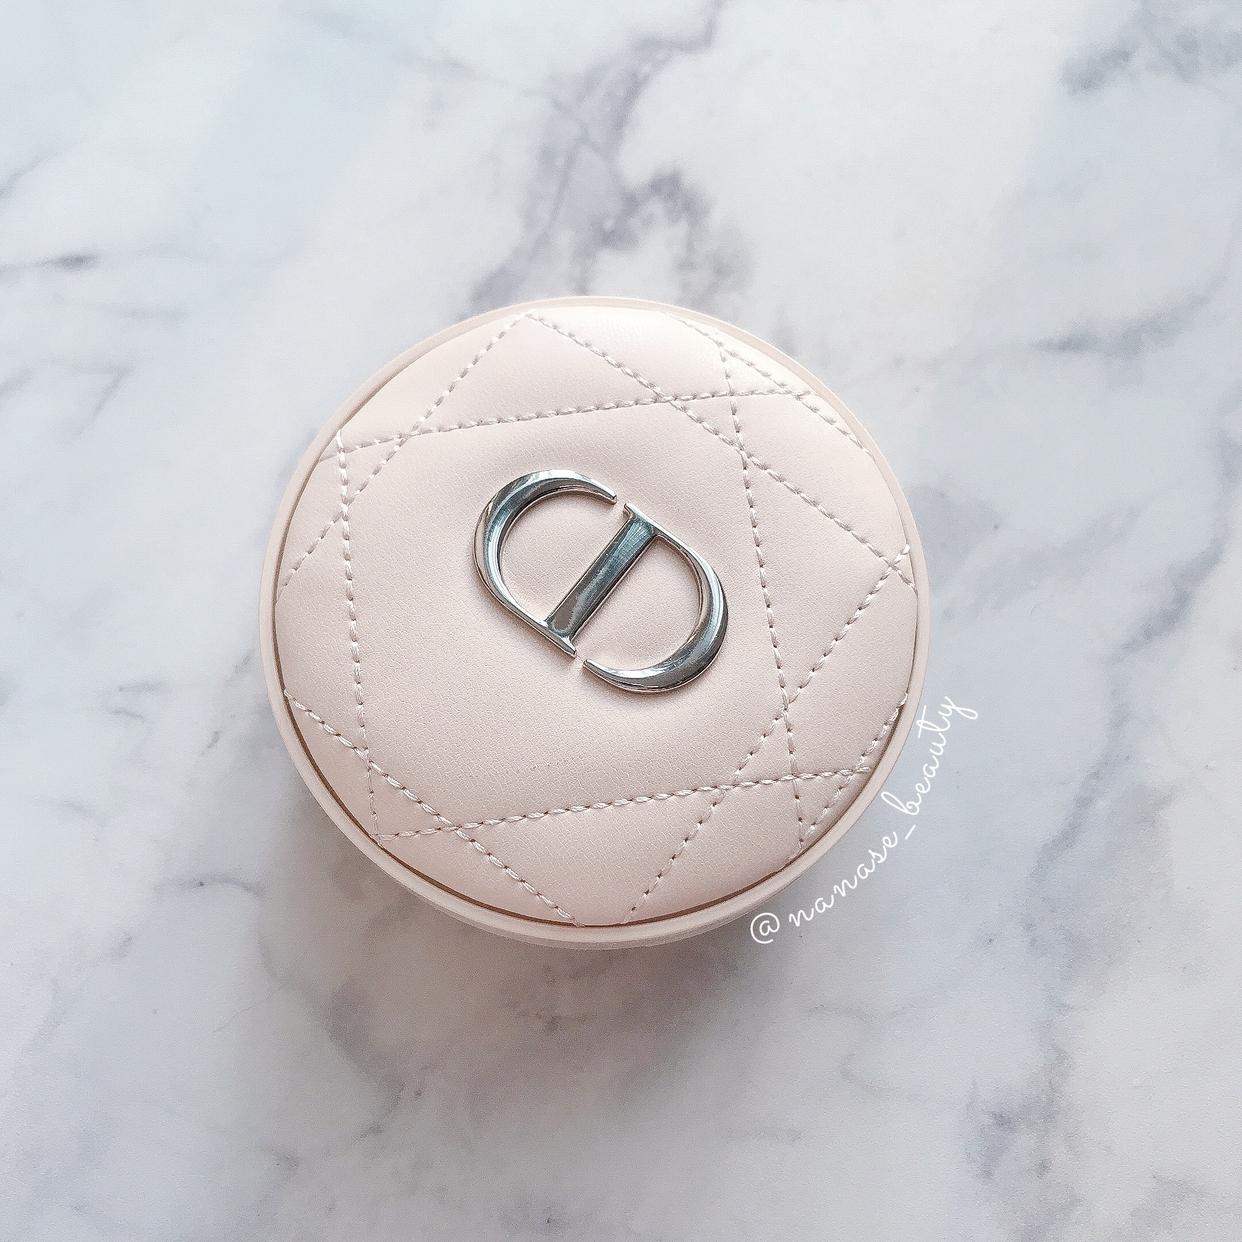 Dior(ディオール) フォーエヴァー クッション パウダーの良い点・メリットに関する七瀬さんの口コミ画像1